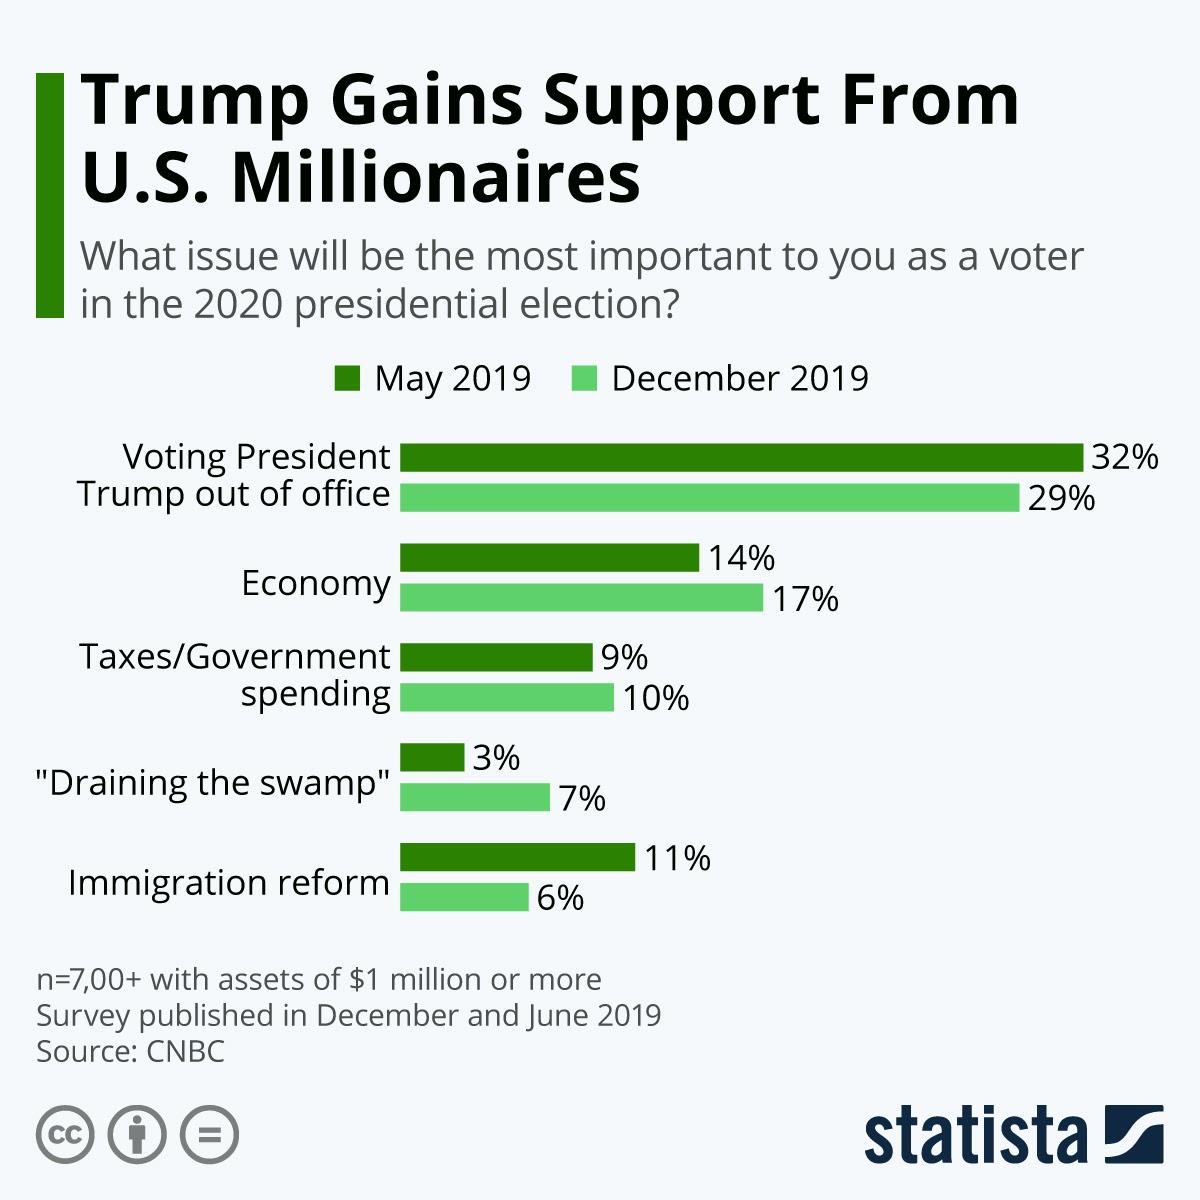 donald-trump-favorite-amongst-millionaires #infographic